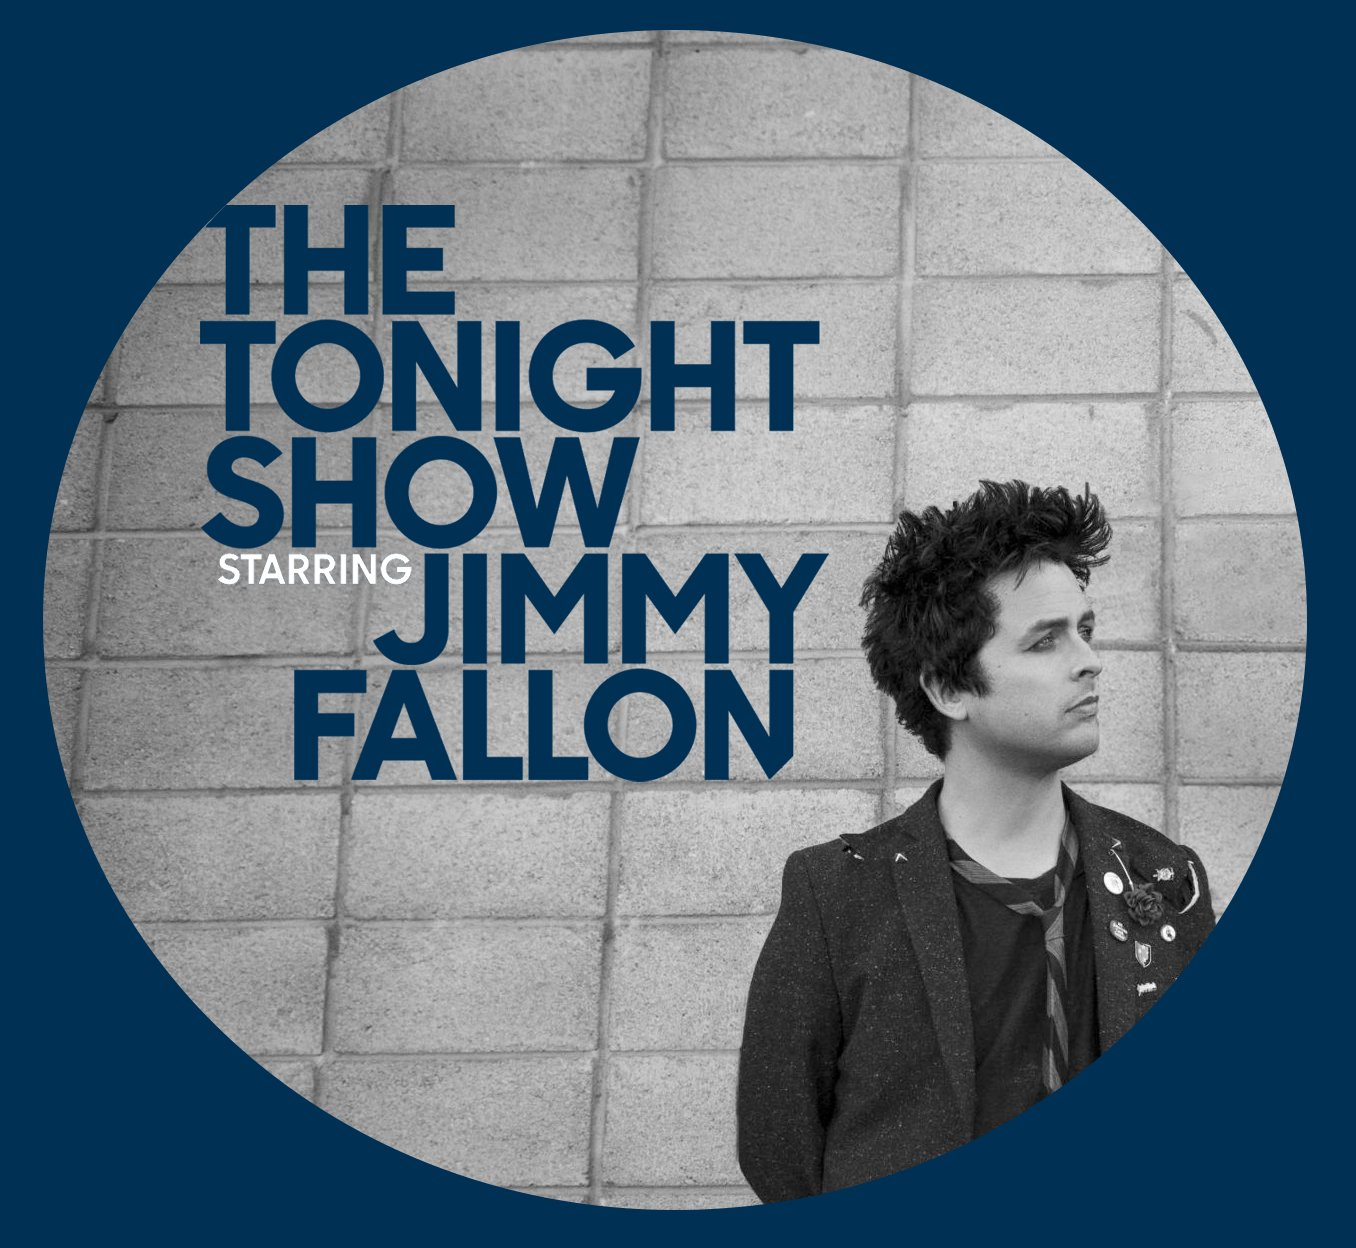 Turn on @FallonTonight tomorrow night at 11:35/10:35c to catch @BillieJoe performing! https://t.co/HK0DiHGliq